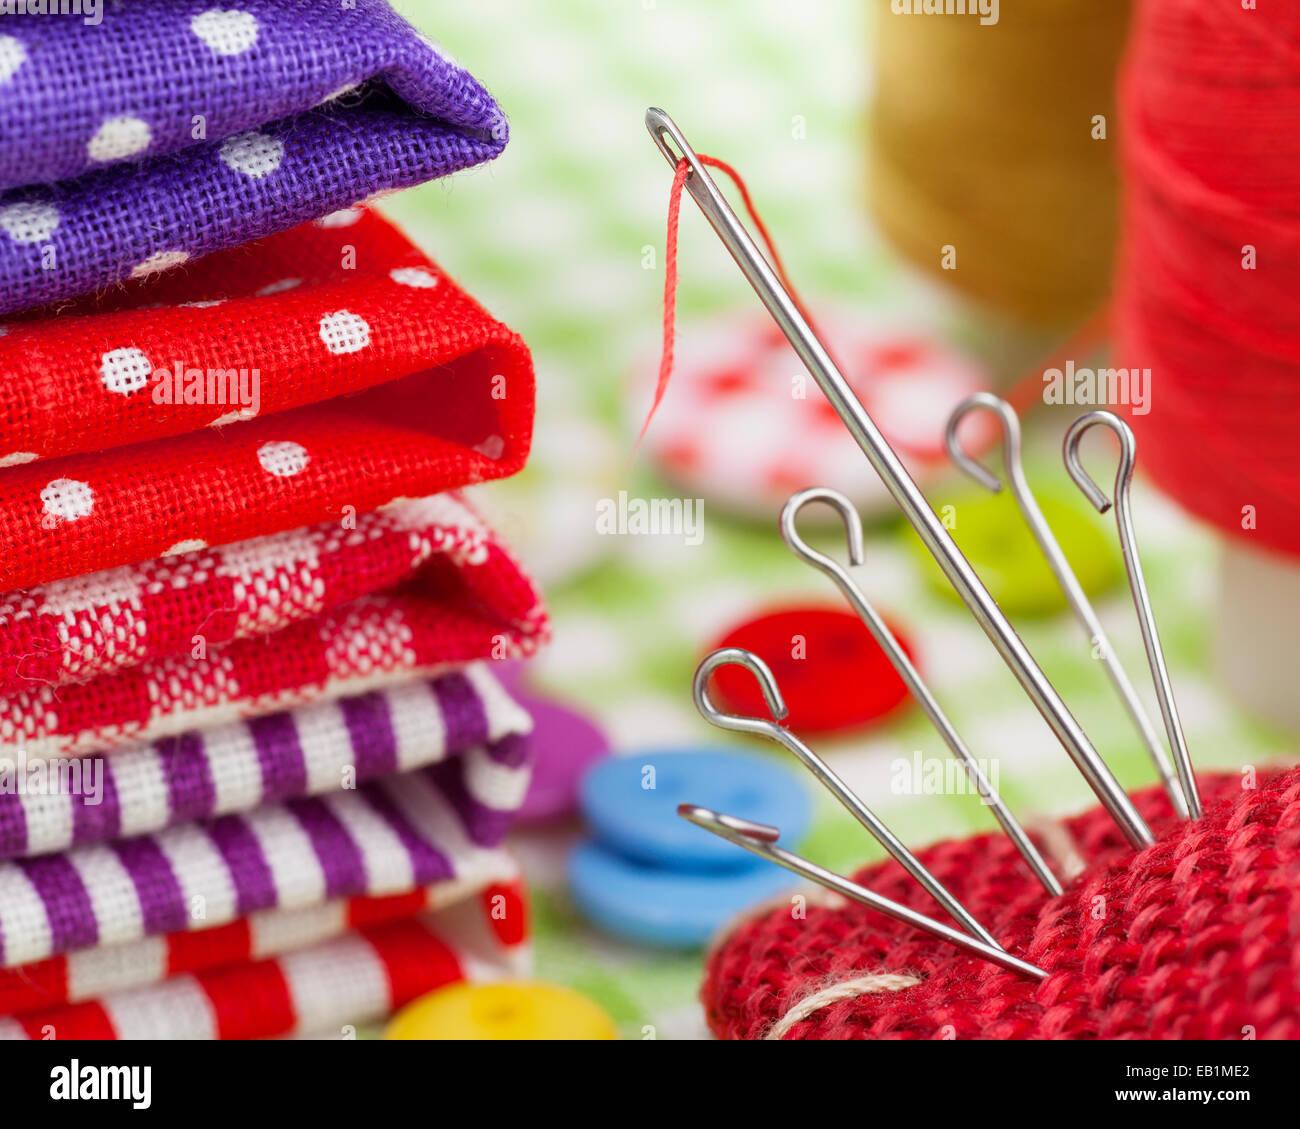 Elementos de costura: telas coloridas, botones acerico, dedal, bobina de hilo Foto de stock